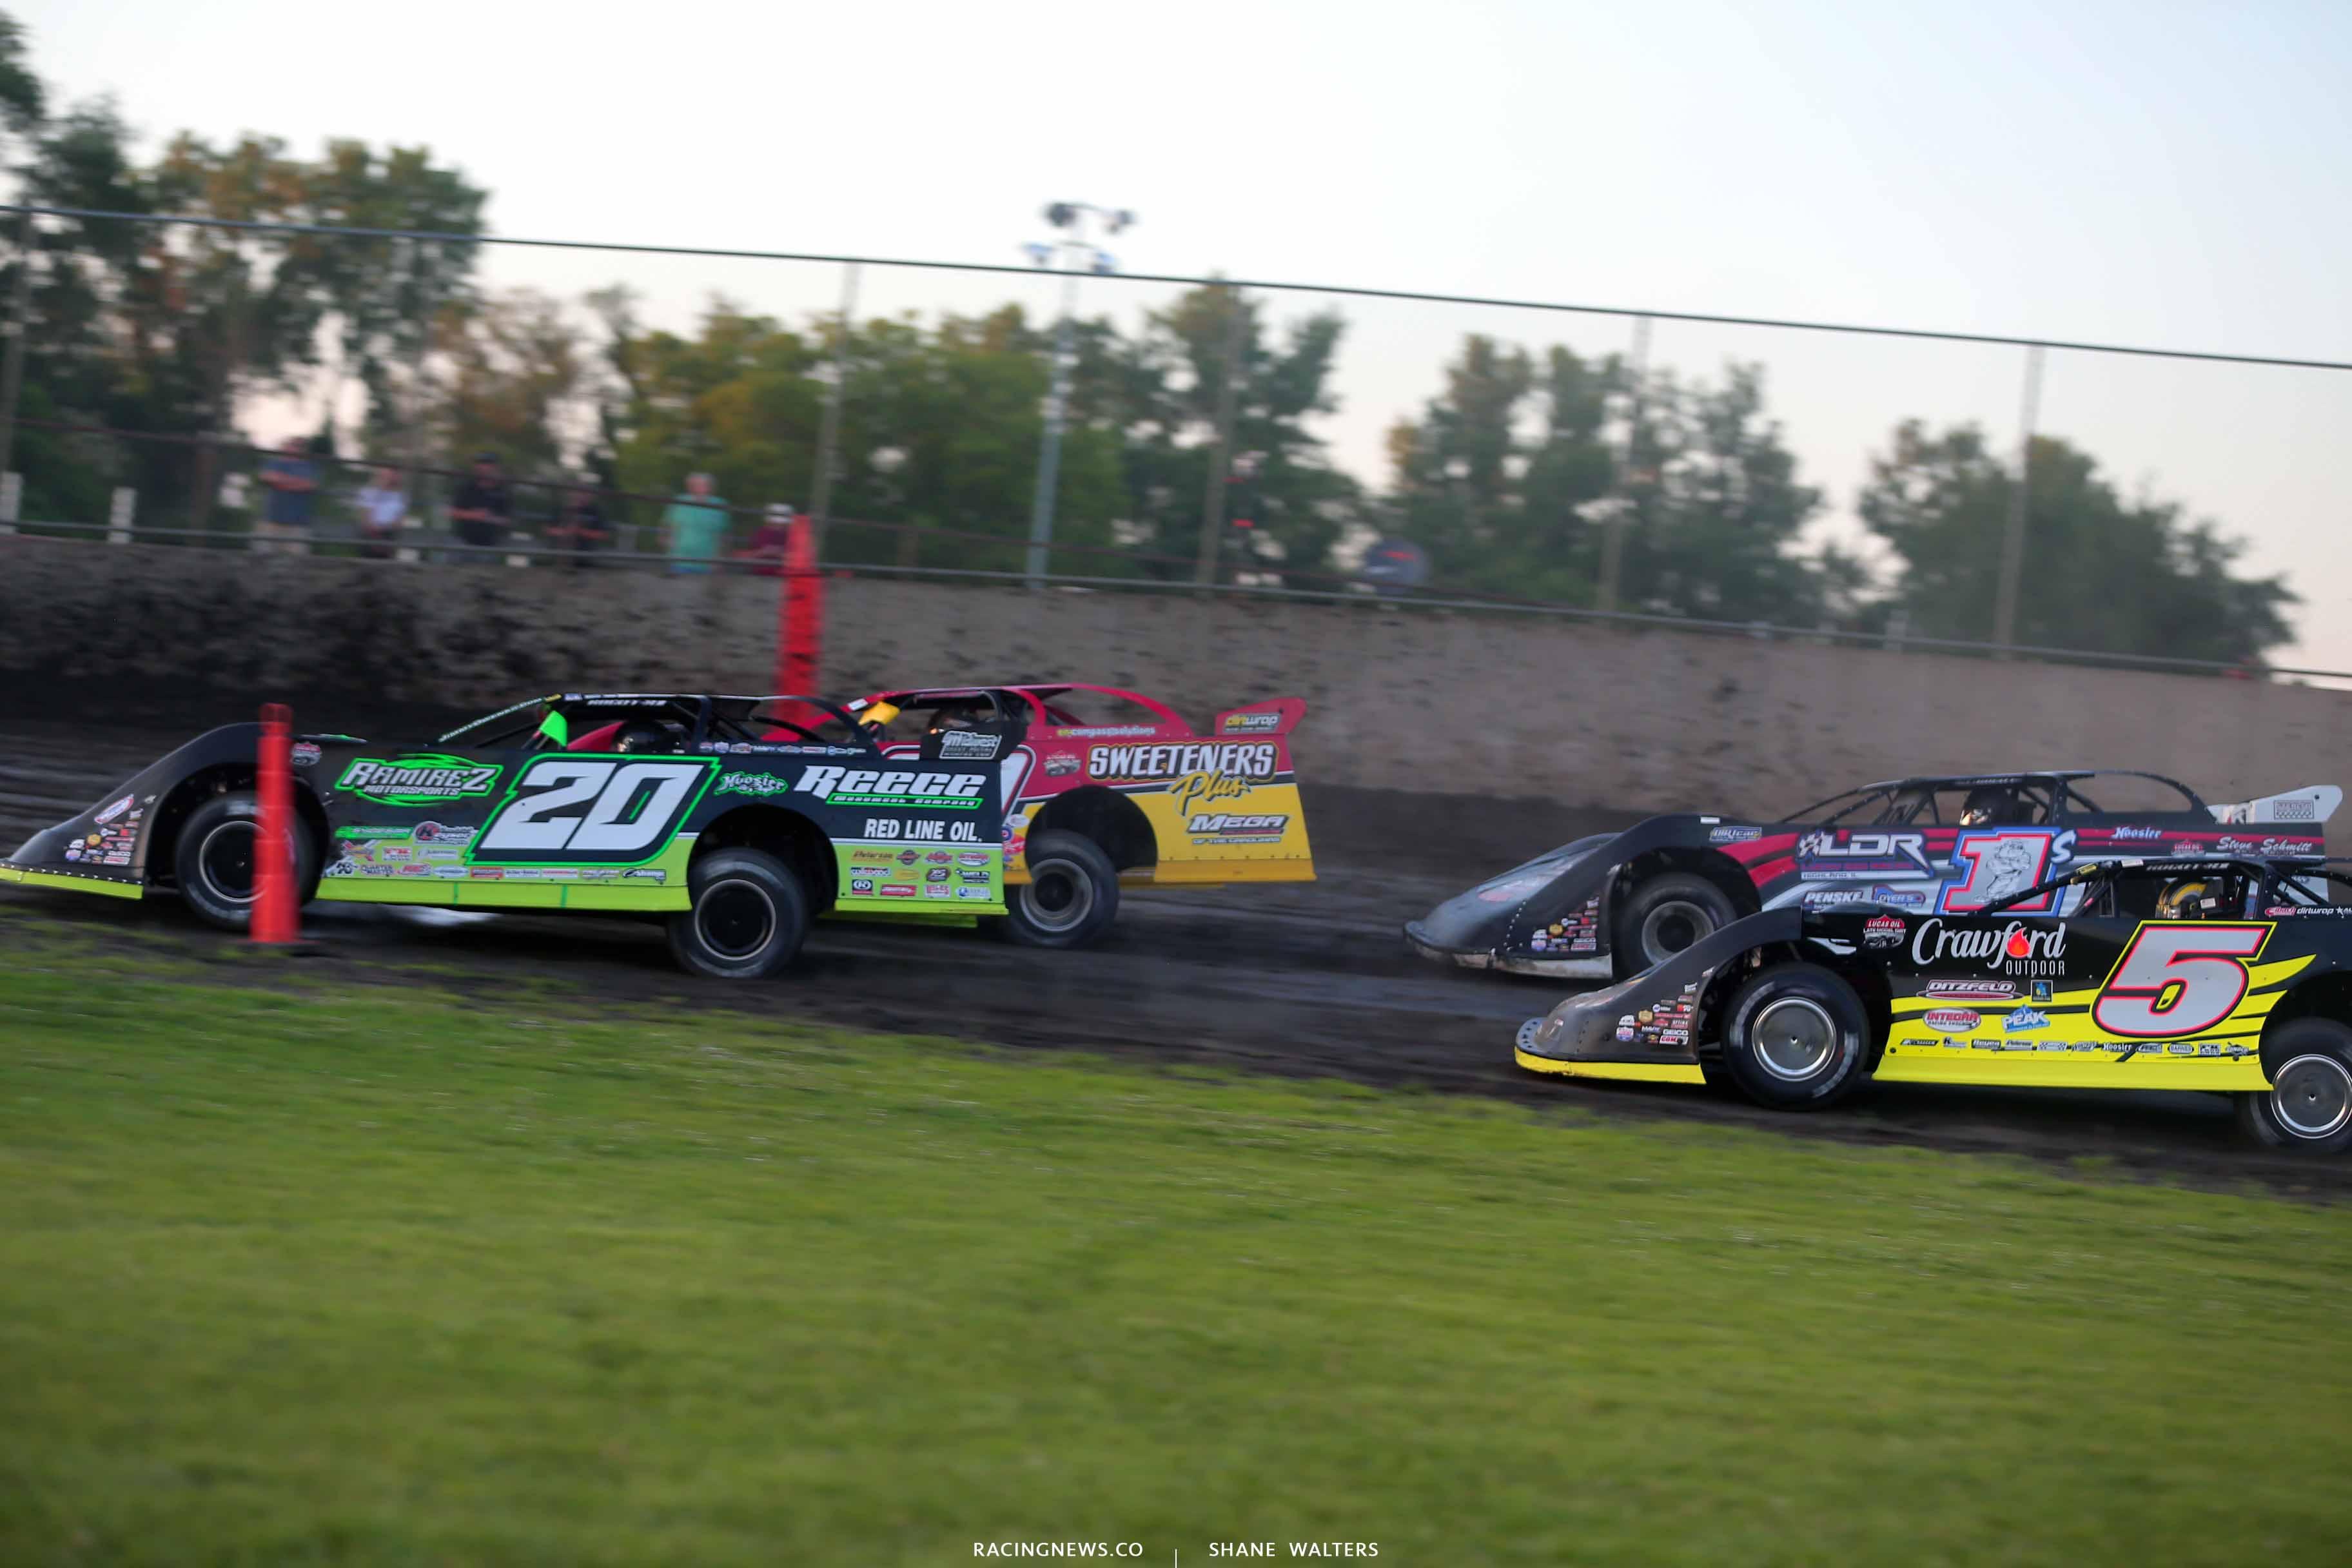 Jimmy Owens, Tim McCreadie, Michael Norris and Risk Salter at Tri-City Speedway - LOLMDS 8525